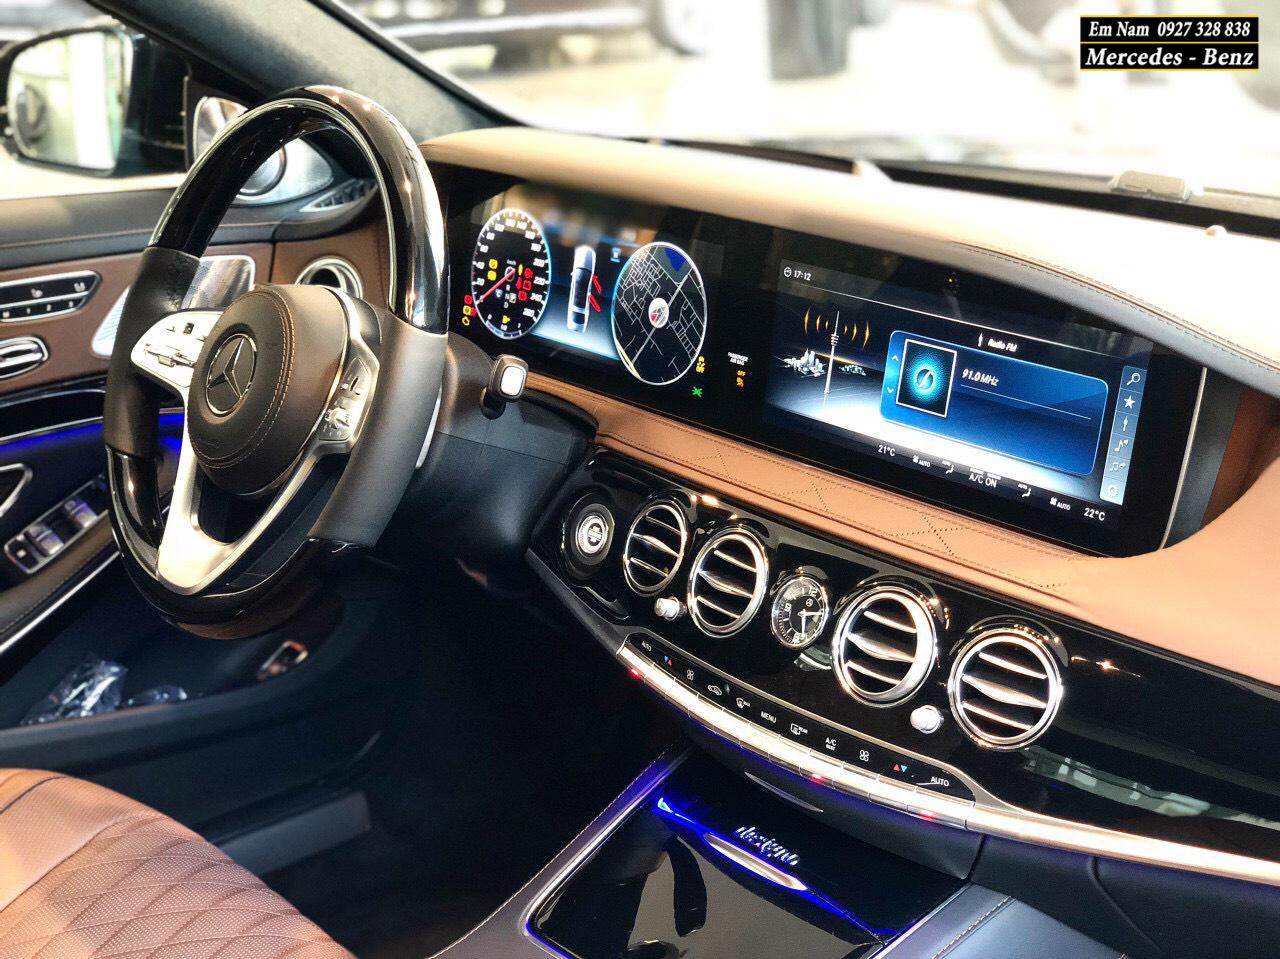 noi-that-mercedes-s450-l-luxury-mercedes-hai-phong-4